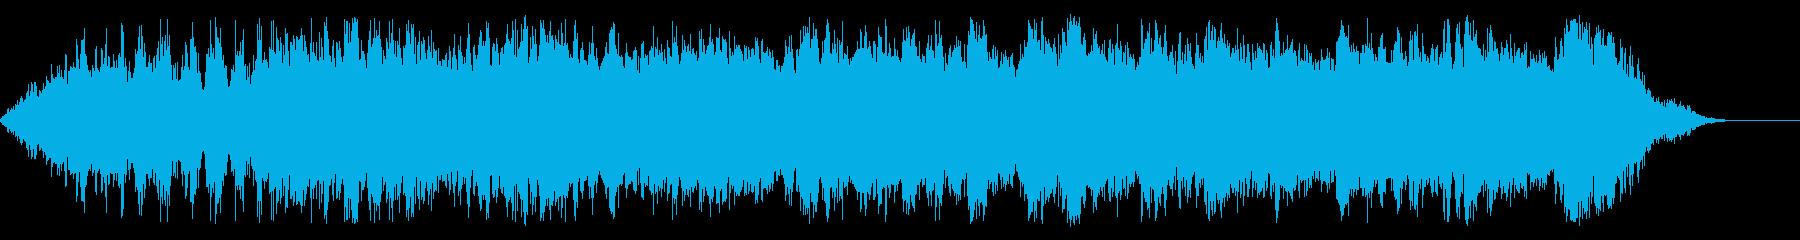 RPGの戦闘系オーケストラの再生済みの波形